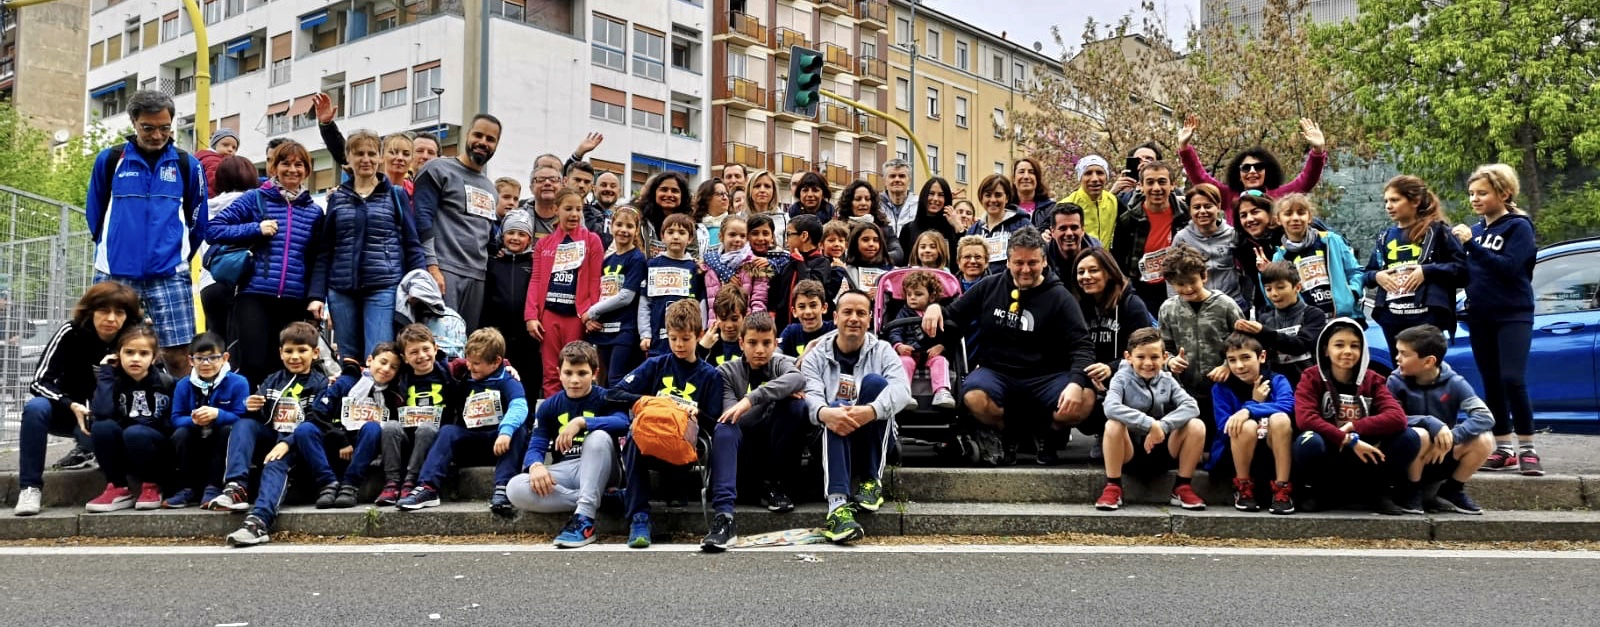 Istituto San Giuseppe La Salle Milano Bridgestone School Marathon 2019_1